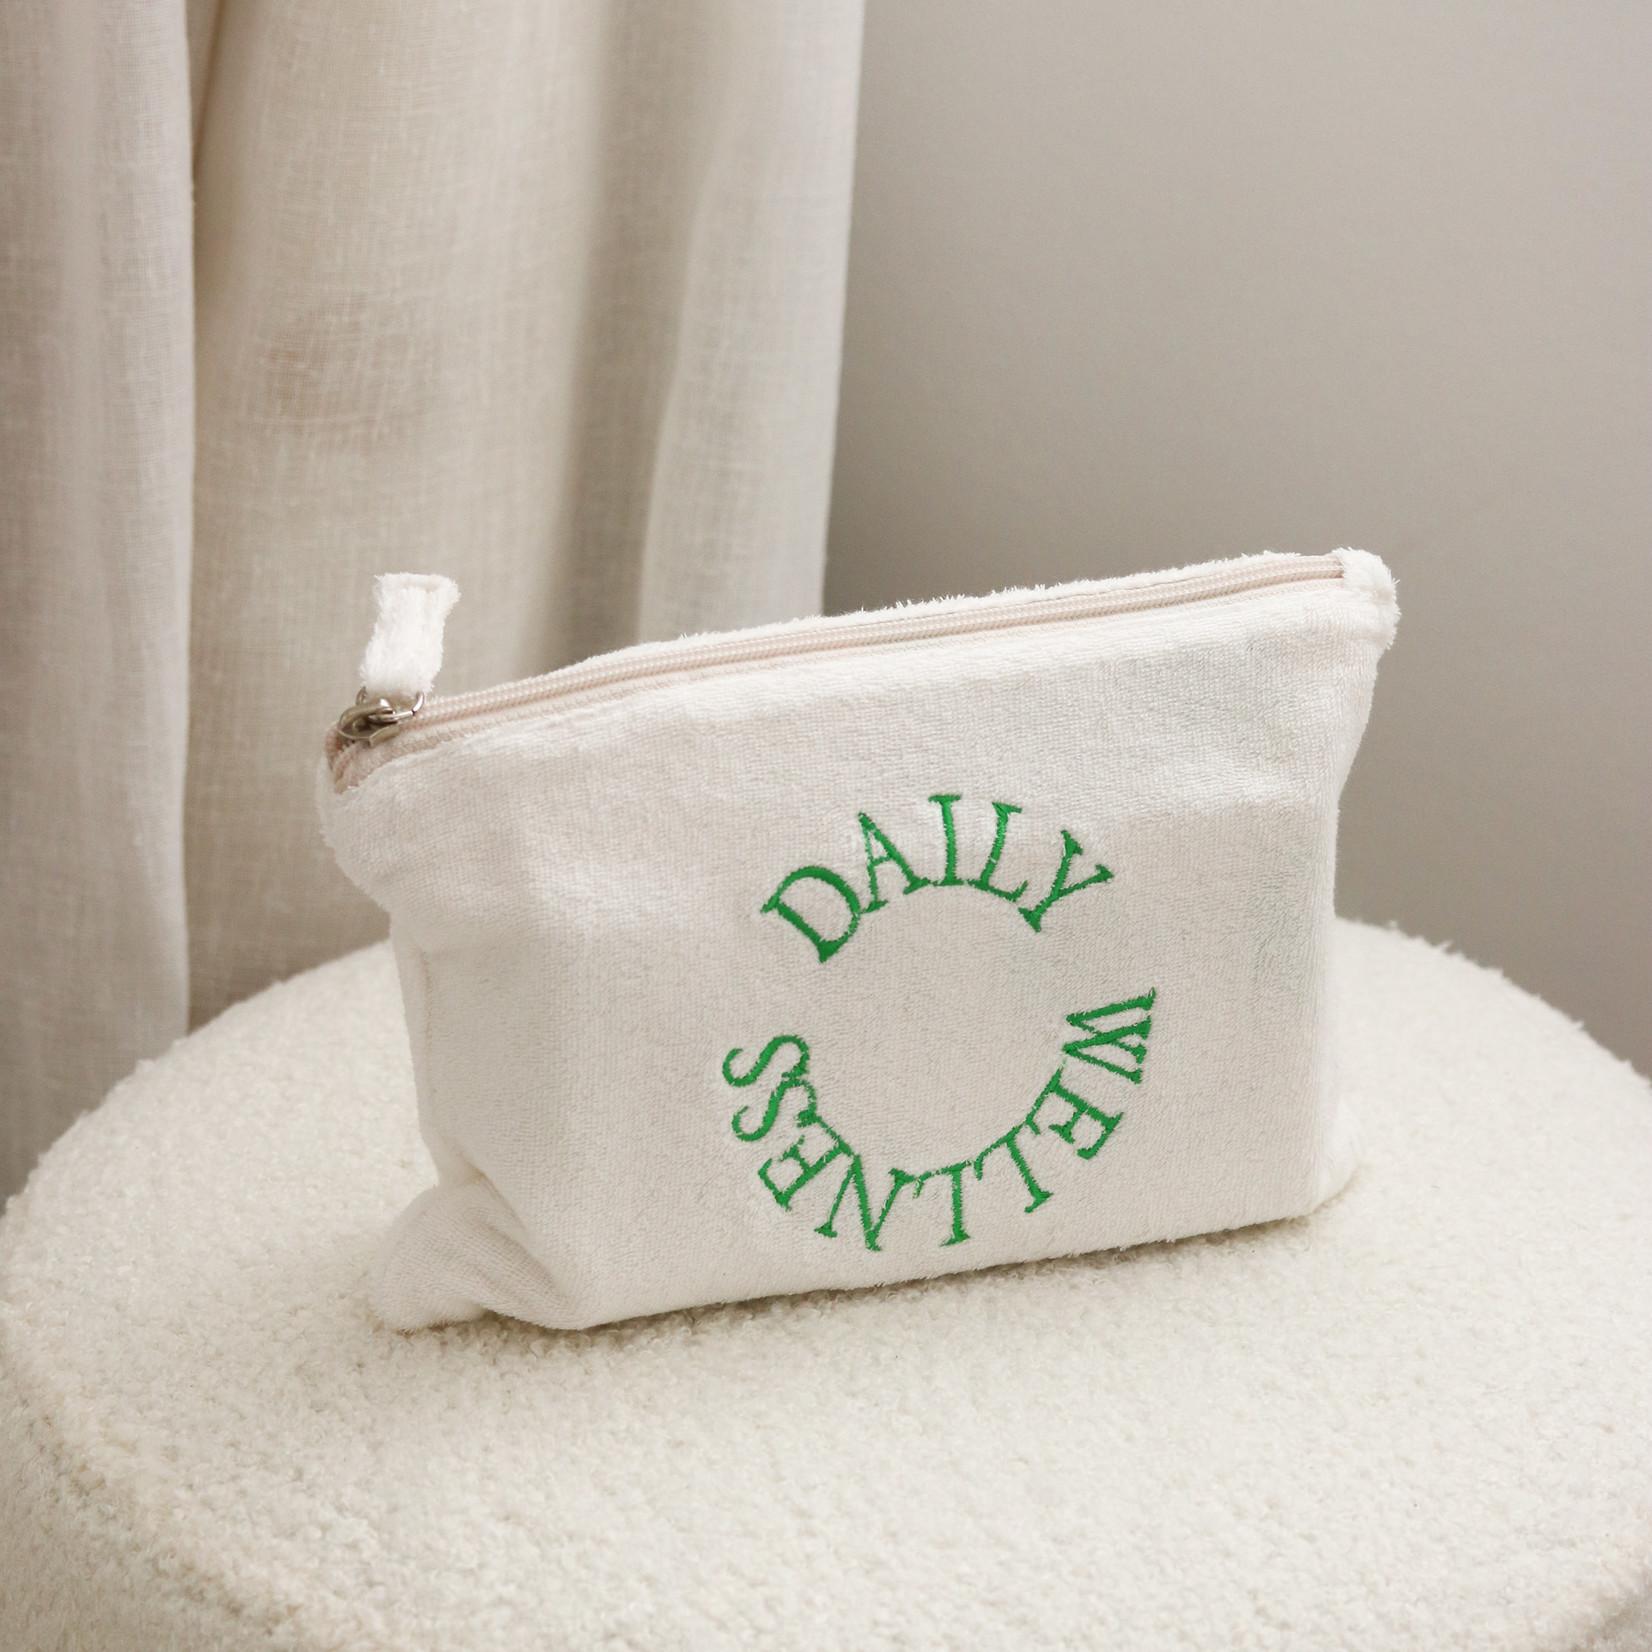 Daily wellness Pochette Terry Daily wellness